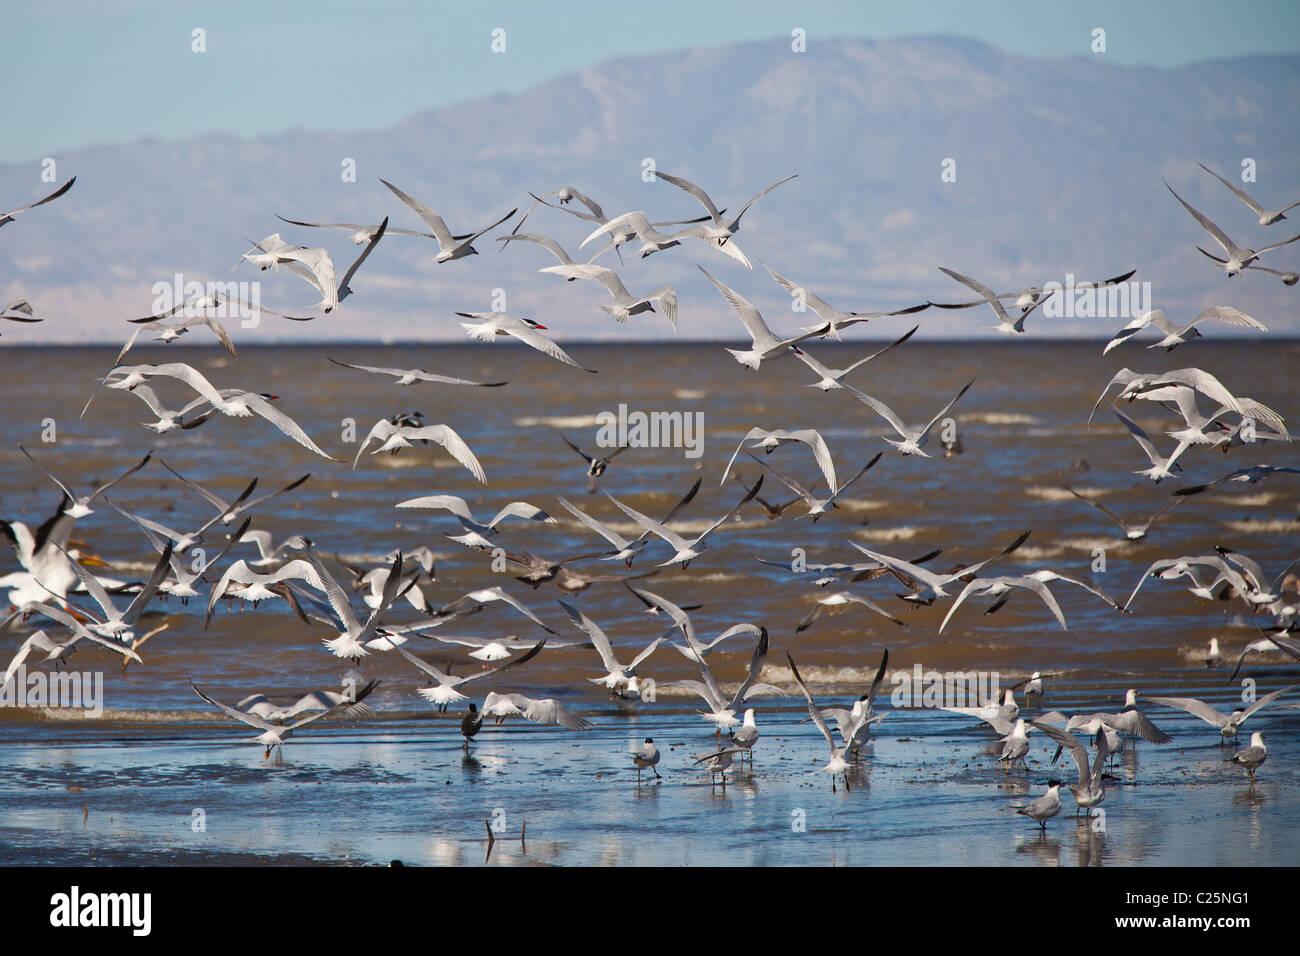 Migrating birds at the Sono Bono National Wildlife Preserve on the Salton Sea, California Stock Photo